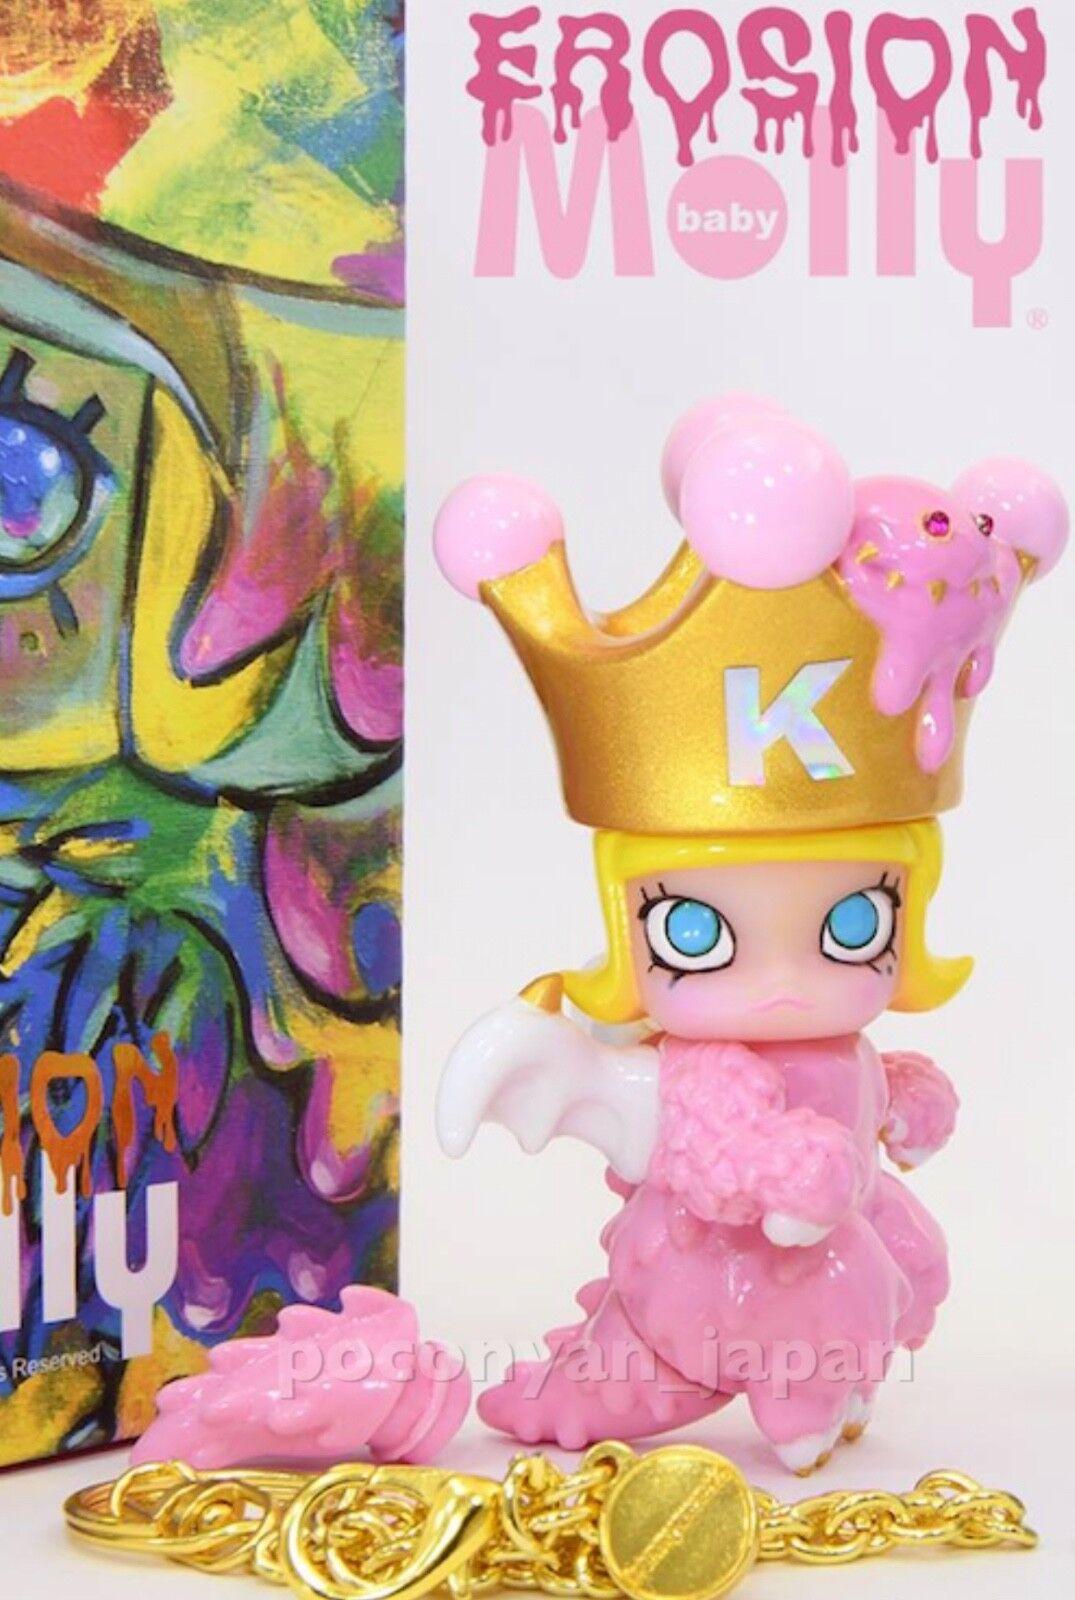 INSTINCTOY kennyswork Baby Erosion Molly Pink Star FIGURE Tokyo Comic con 2018